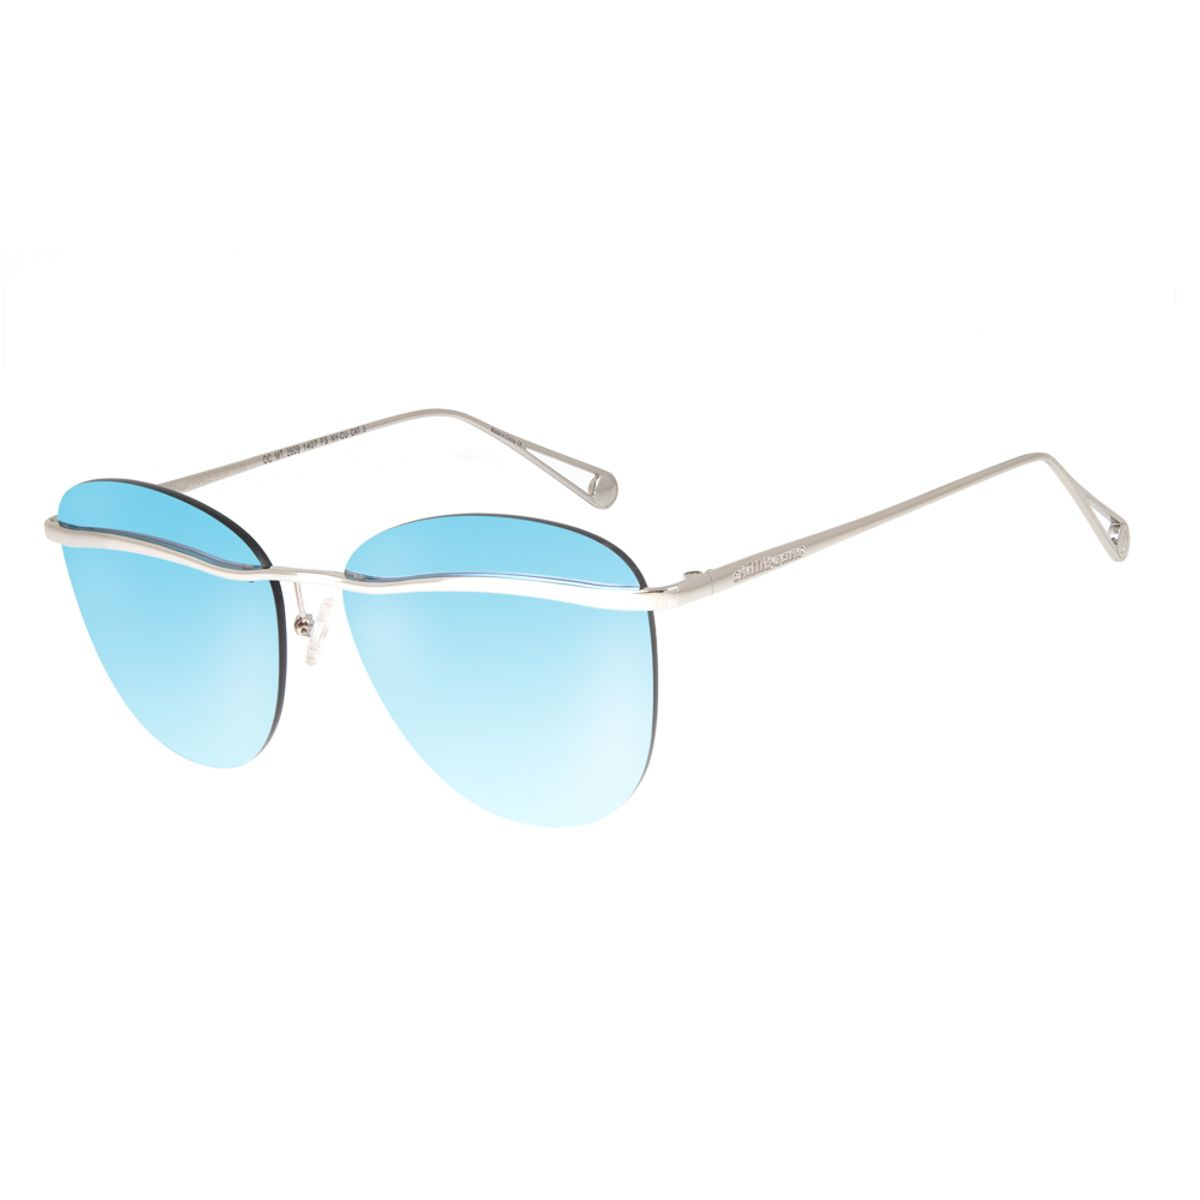 47771f9d4 Óculos de Sol Chilli Beans Feminino Metal Máxi Lente Flutuante Prata ...